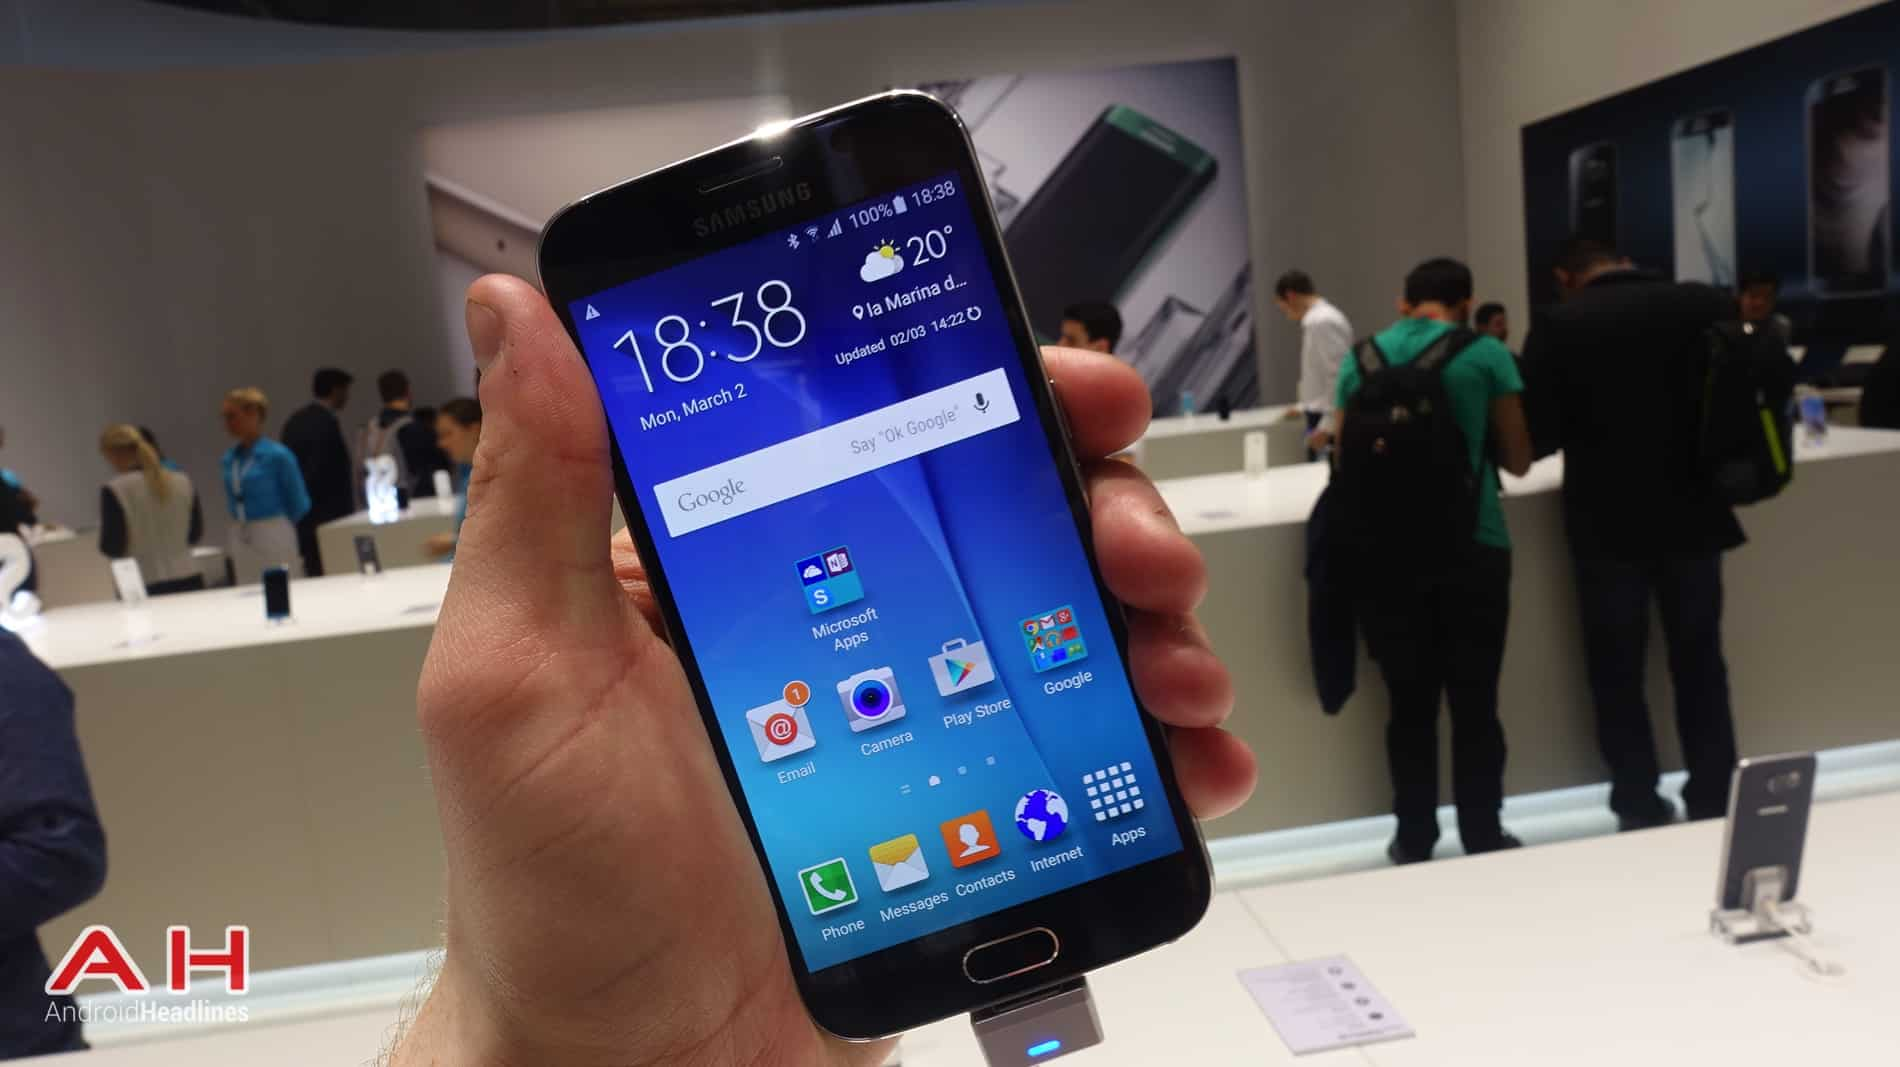 Galaxy S6 and Galaxy S6 Edge MWC AH 12